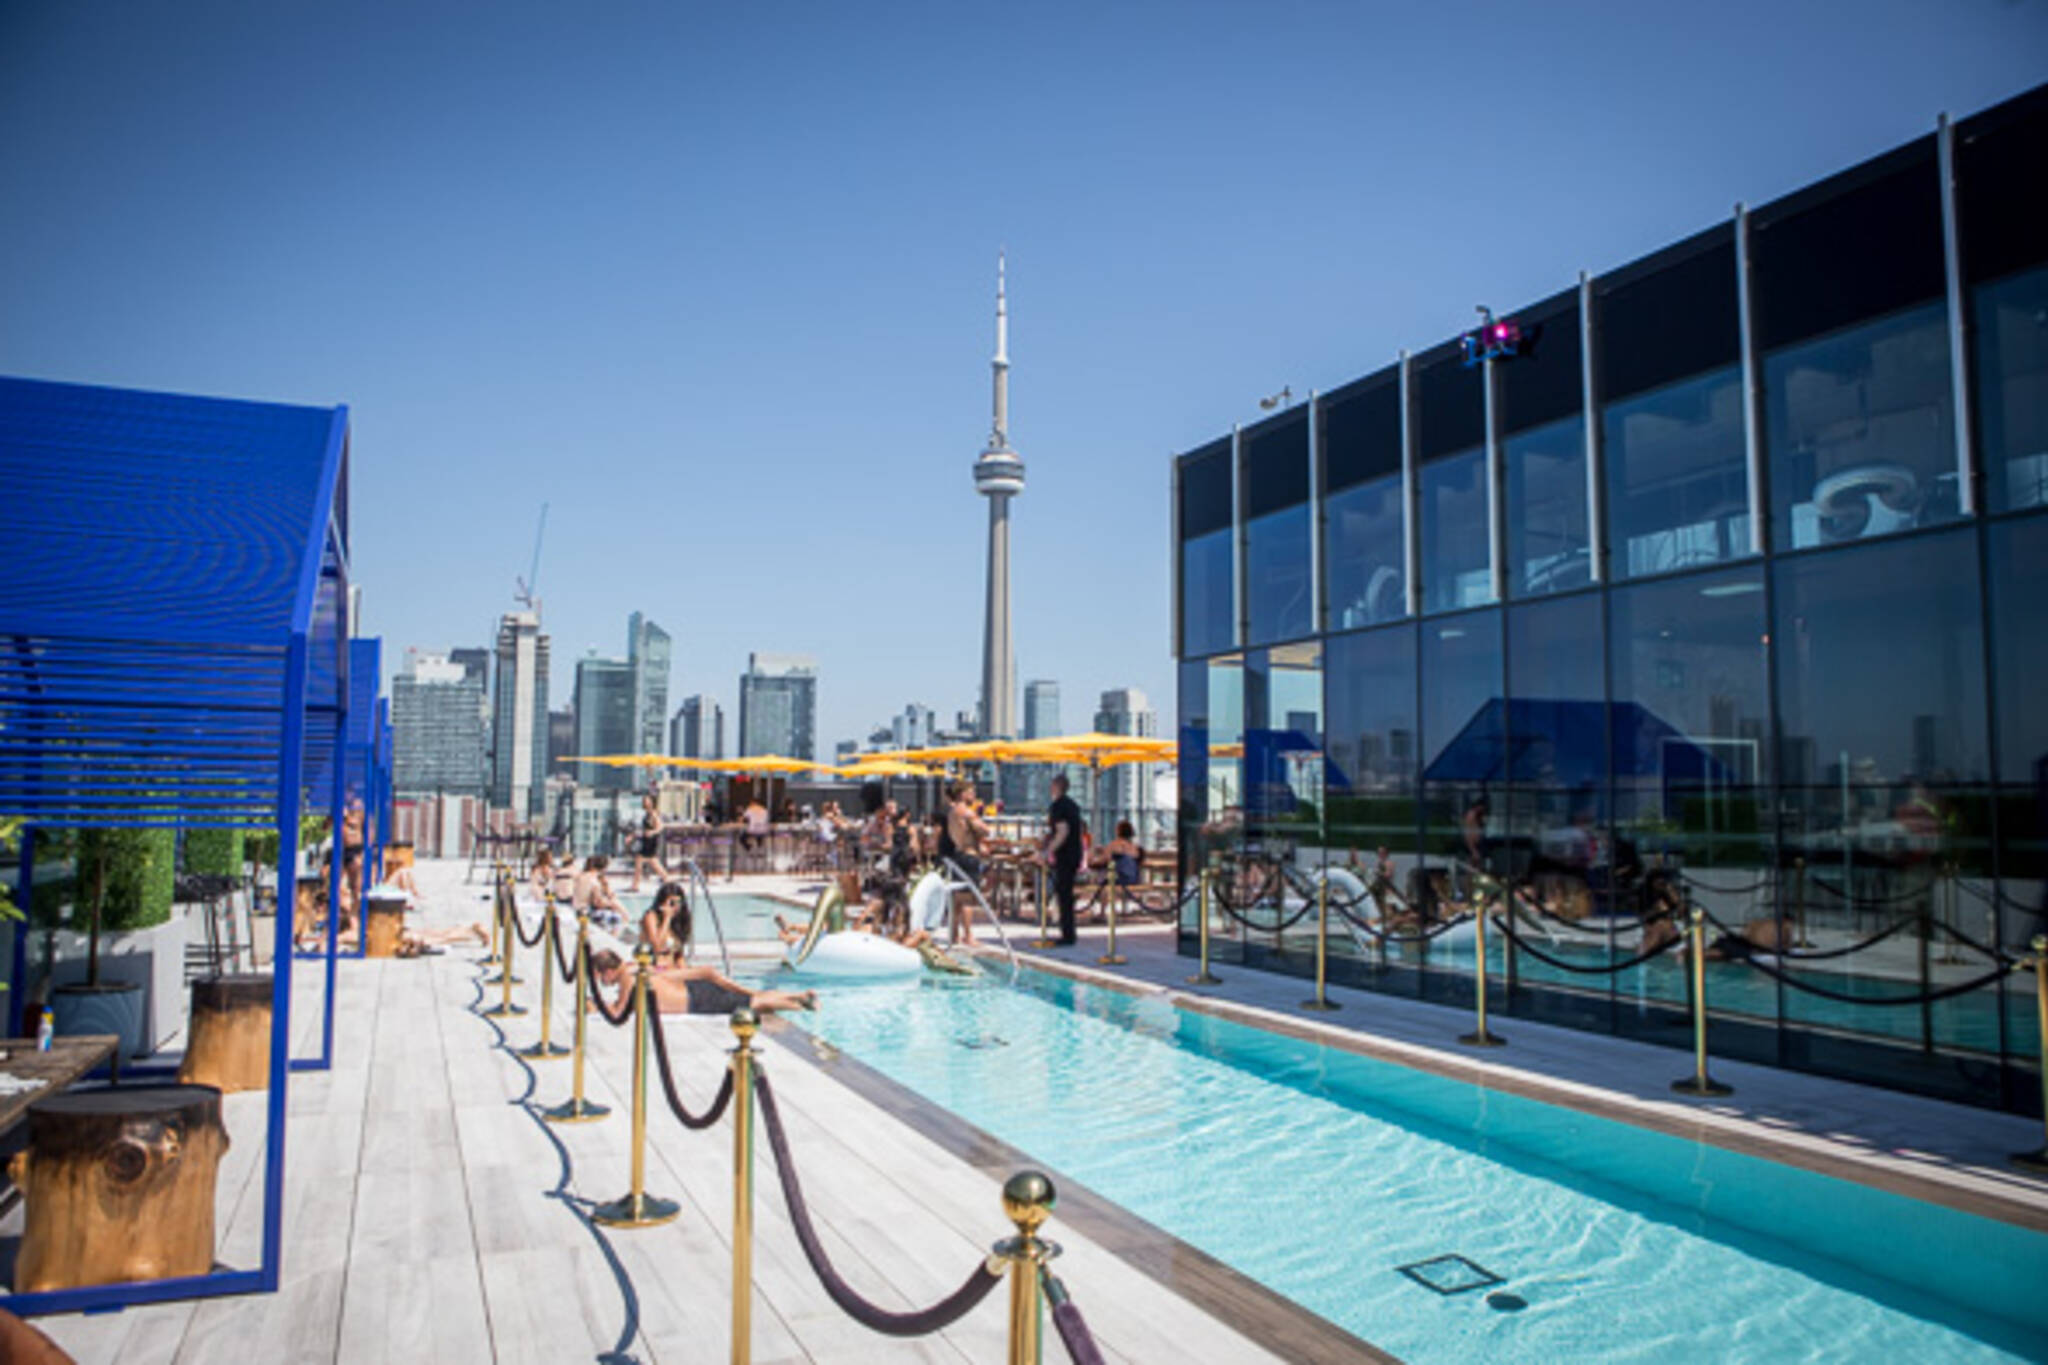 Laville Restaurant Toronto